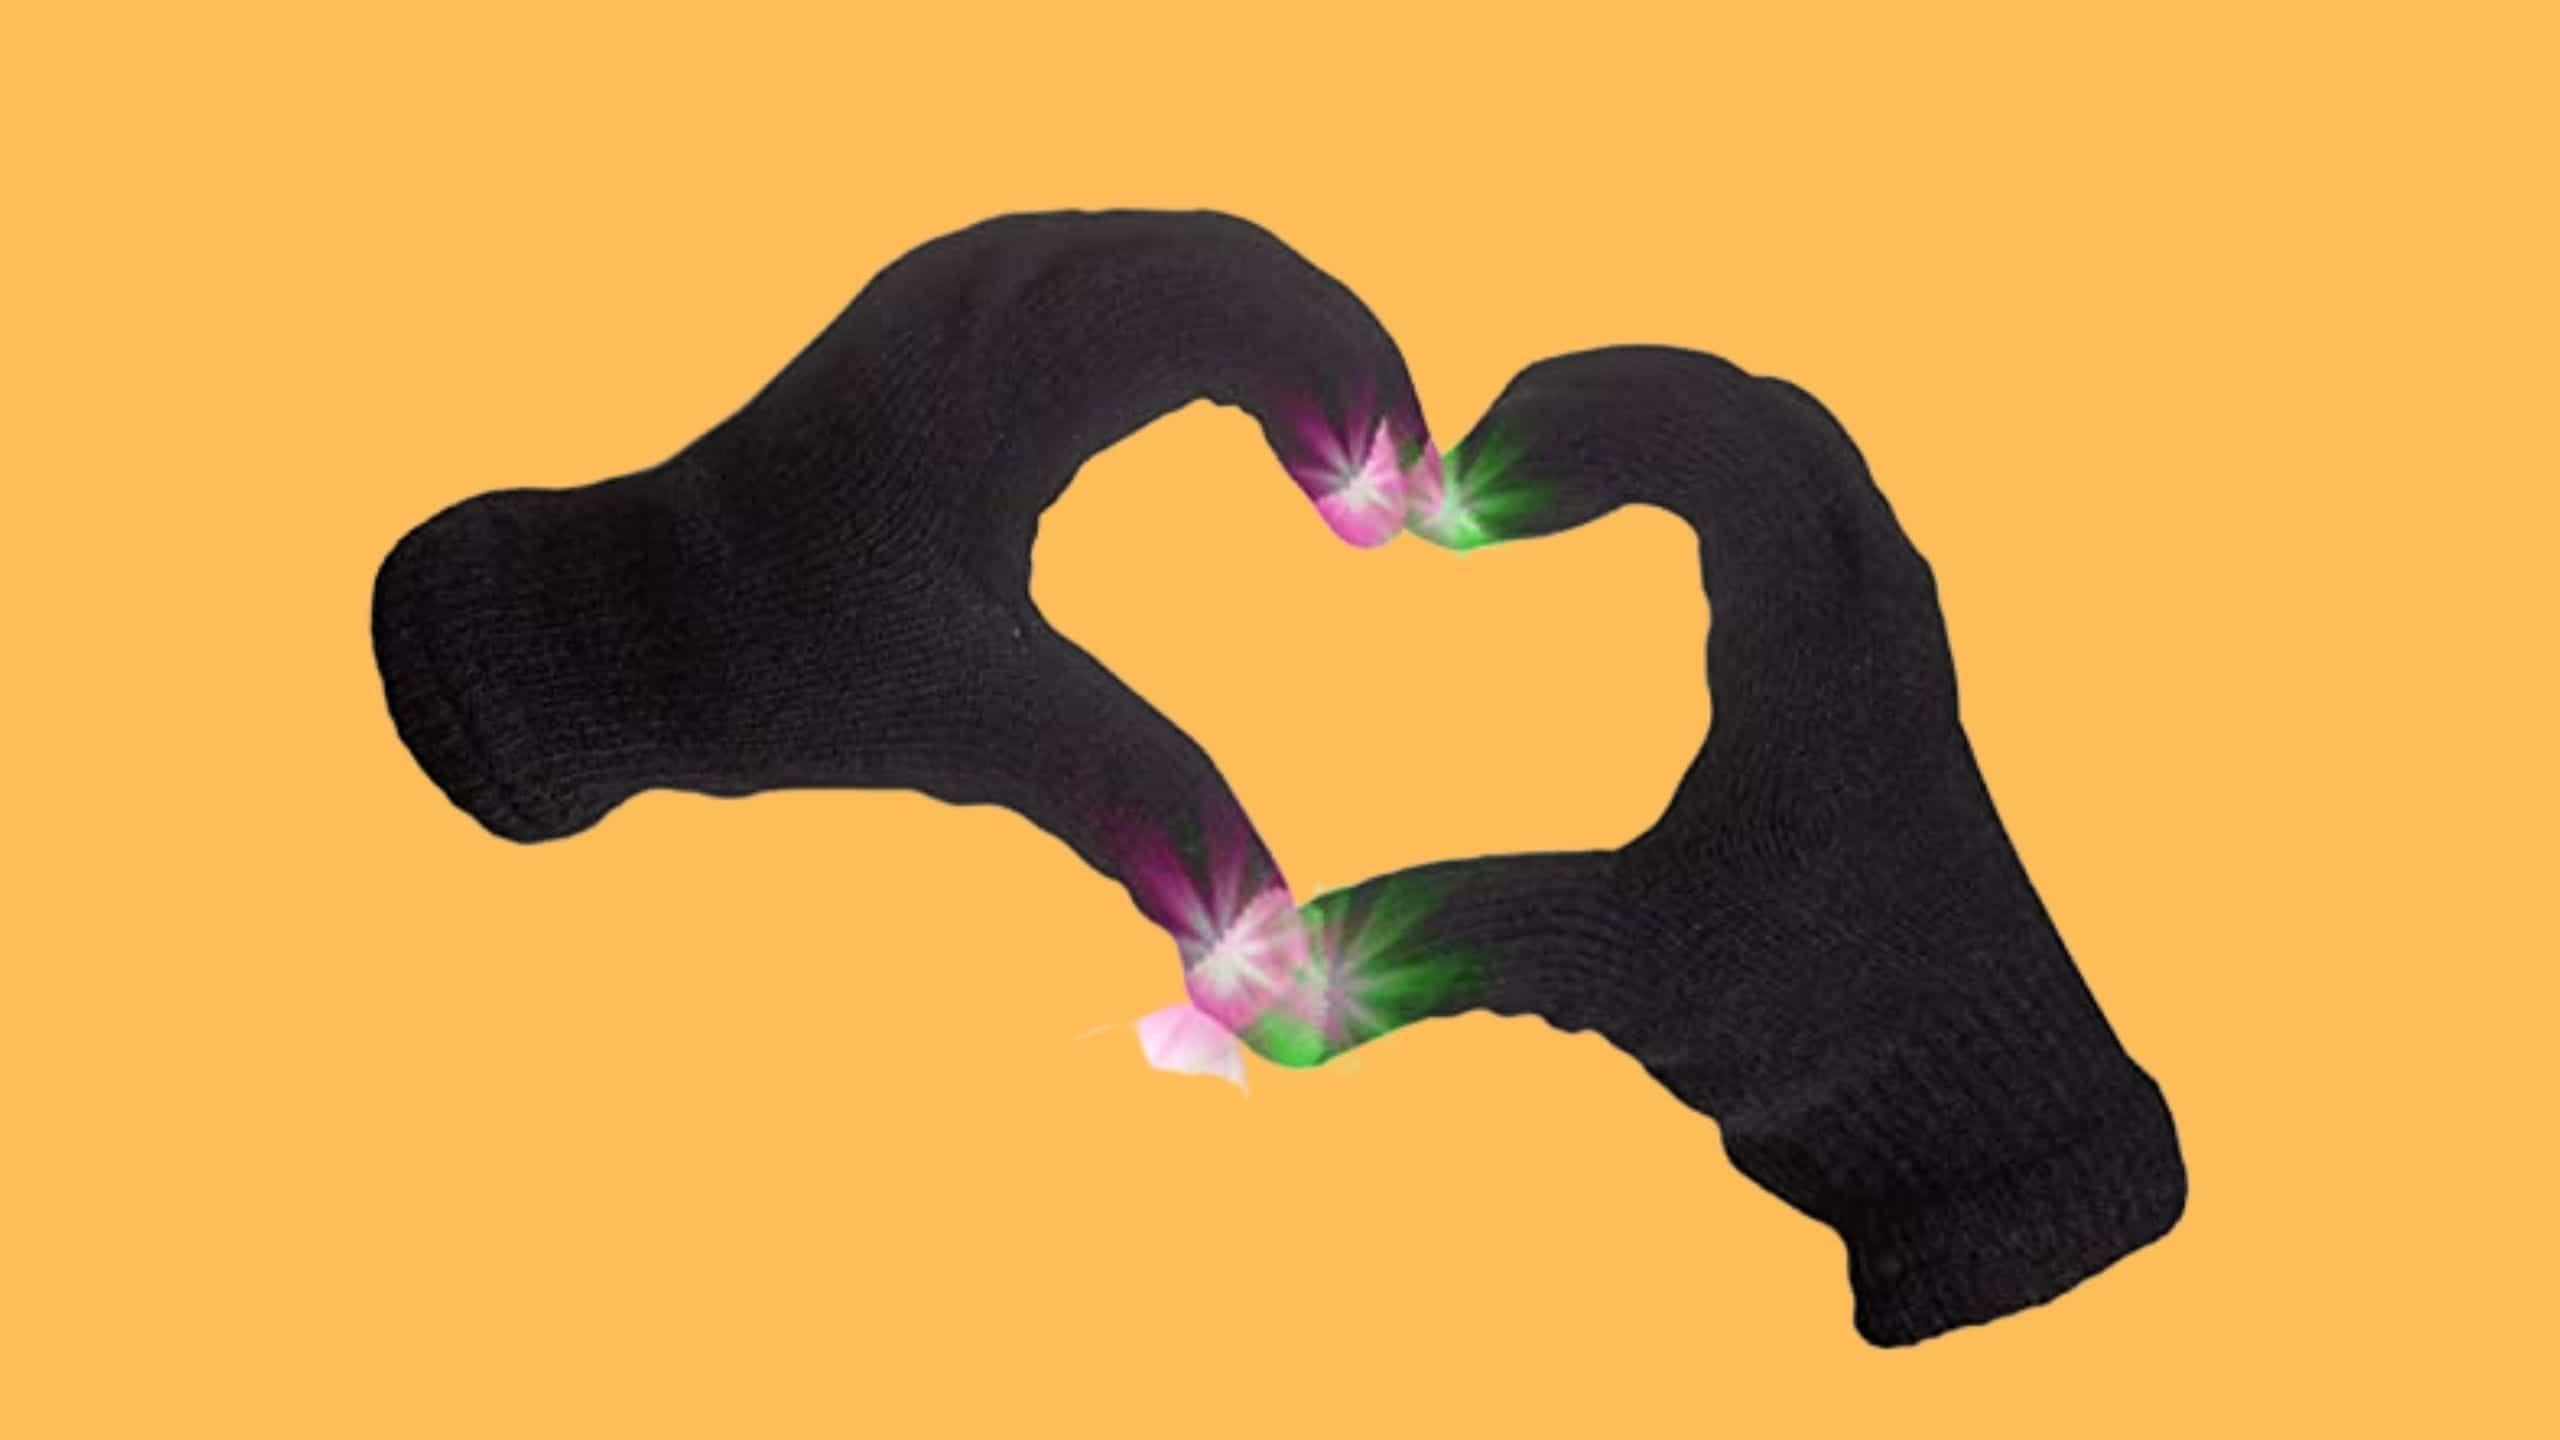 Fun Central LED Gloves for Rave